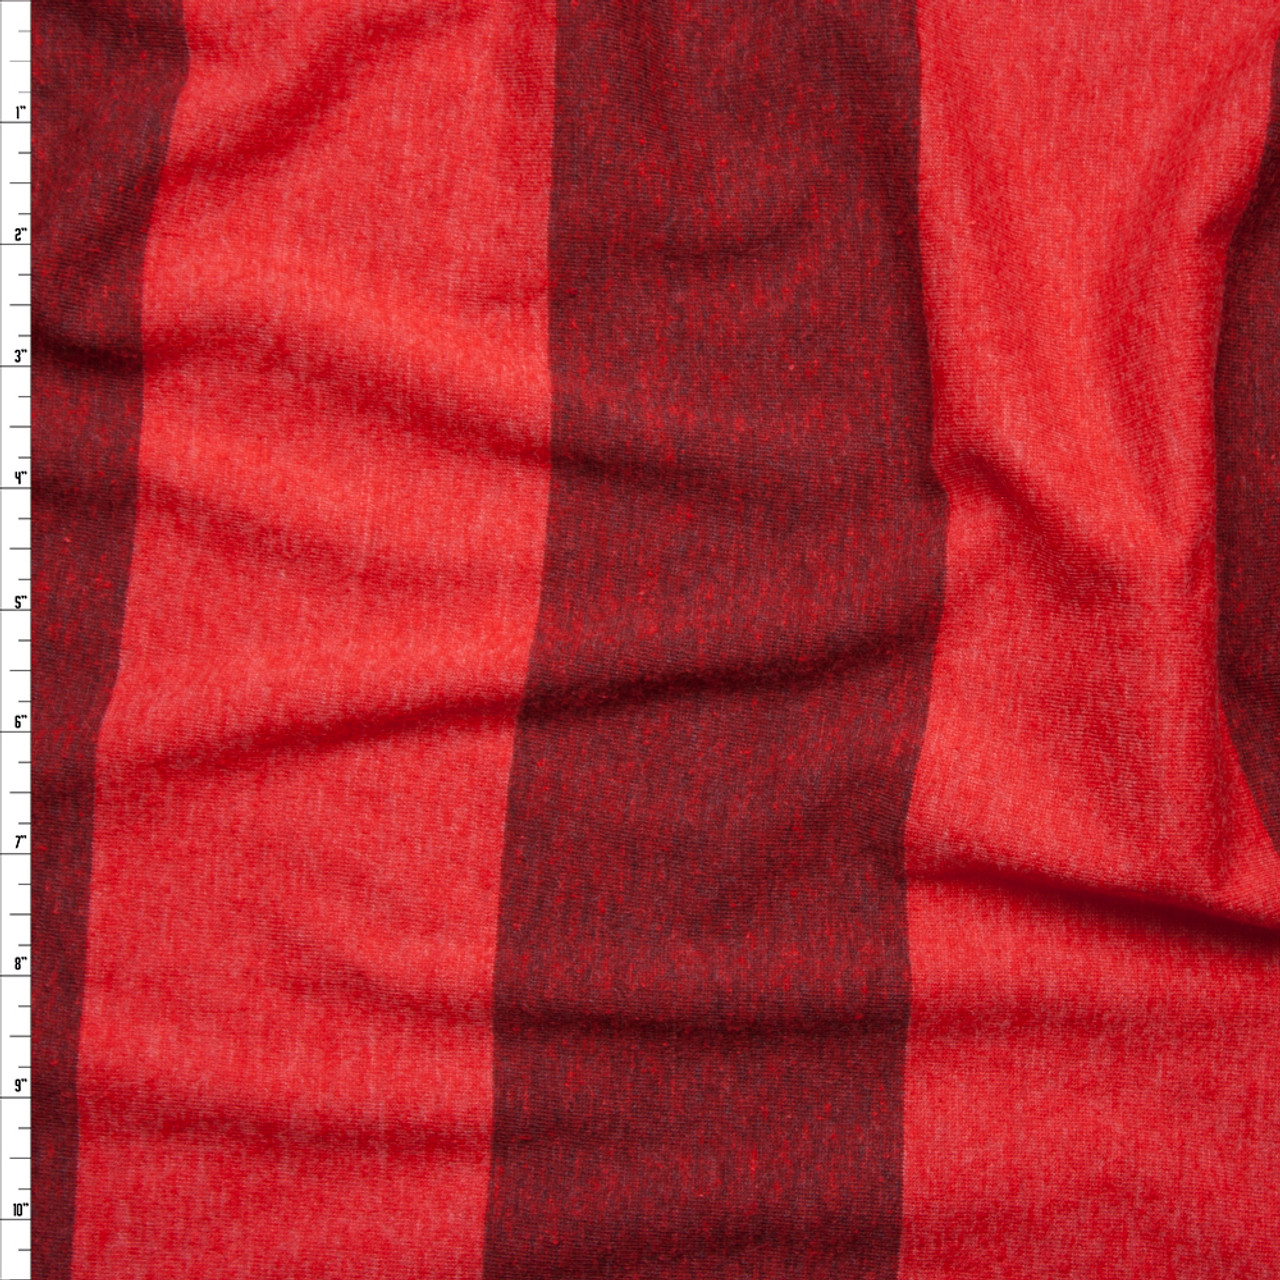 8027b29088c Cali Fabrics Red Wide Stripe Lightweight Jersey Knit Fabric by the Yard